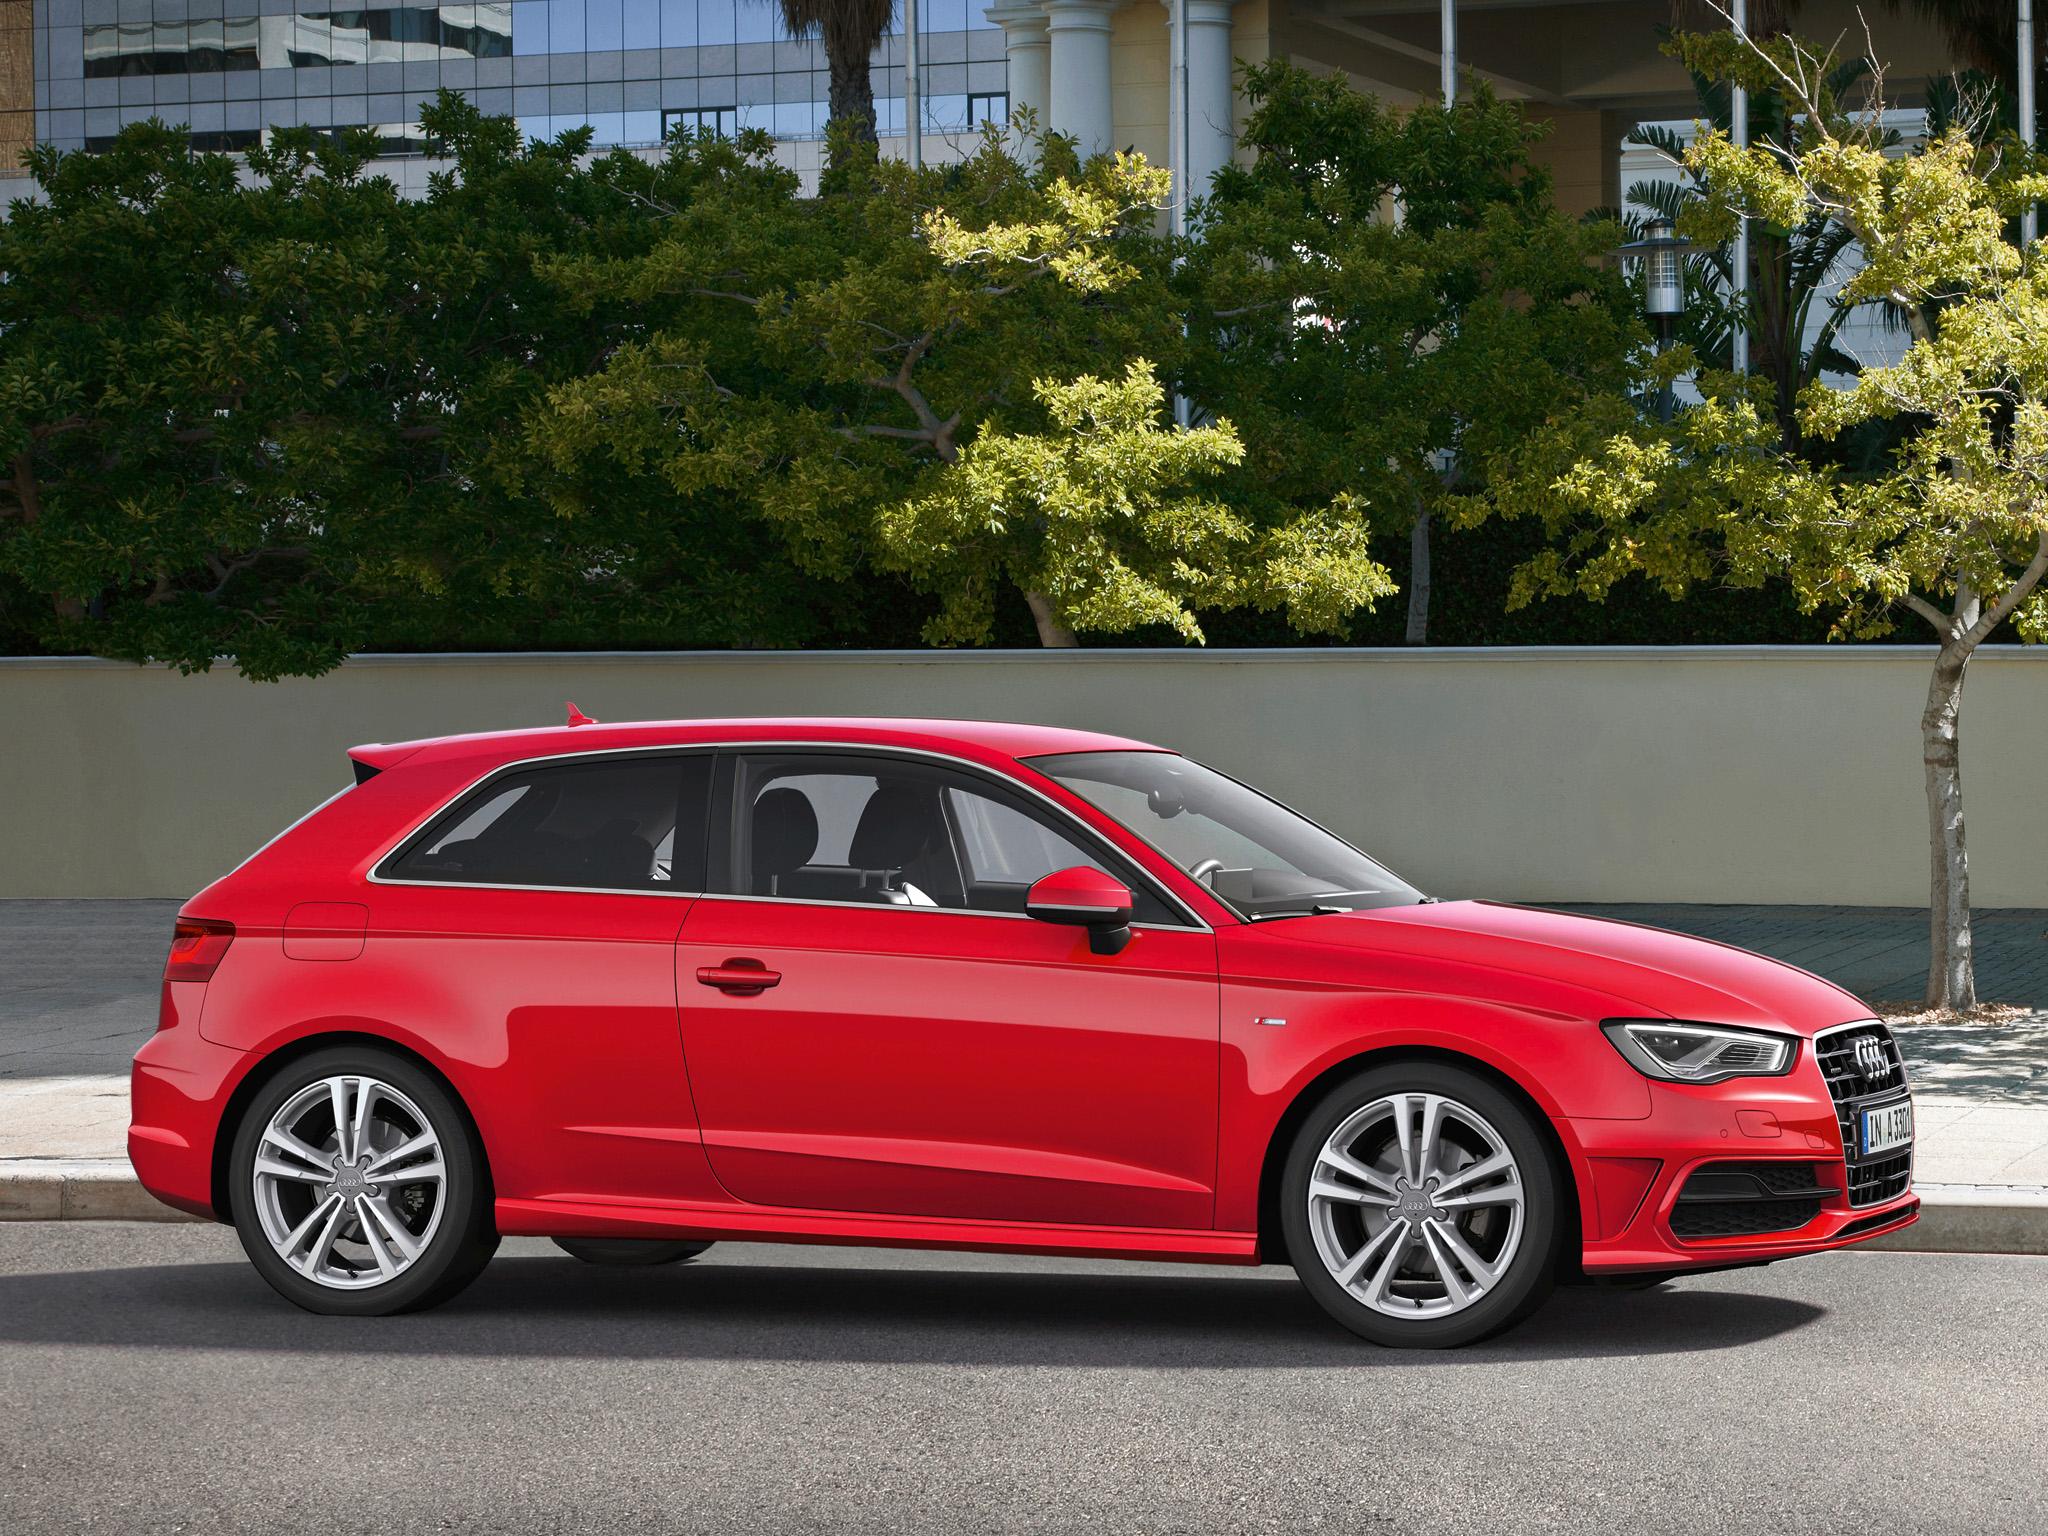 Kekurangan Audi A3 V8 Spesifikasi